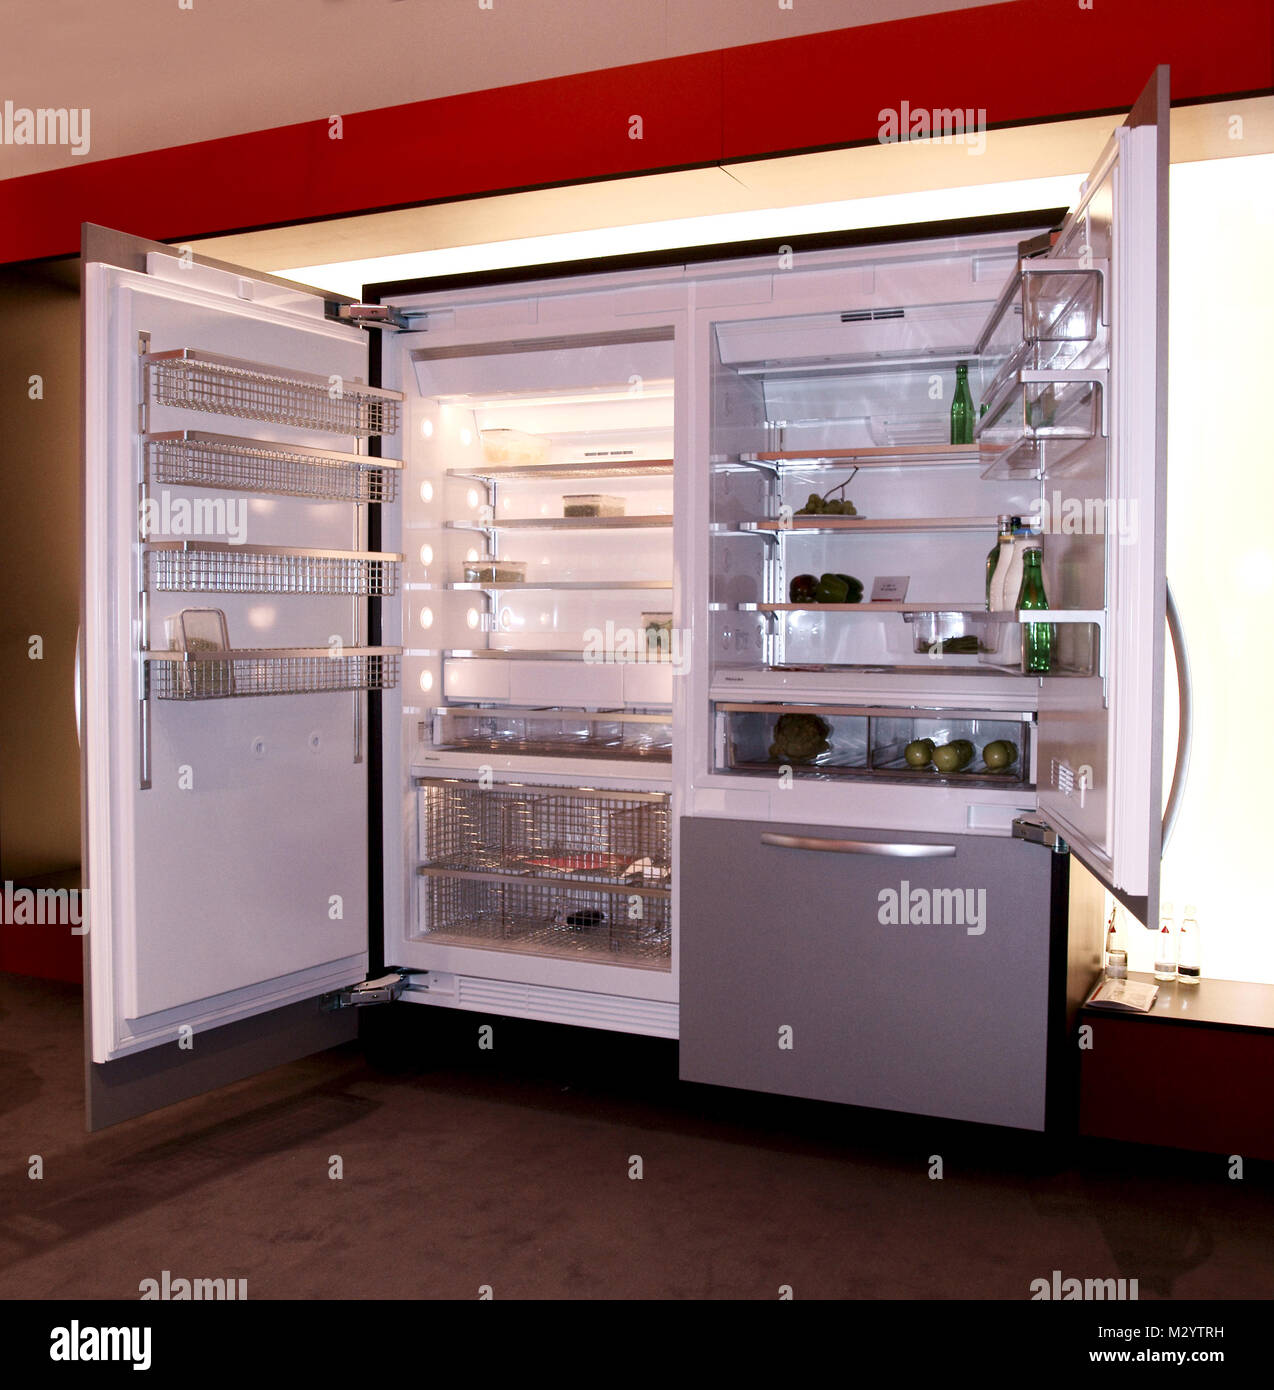 Großer Kühlschrank Stock Photos & Großer Kühlschrank Stock Images ...